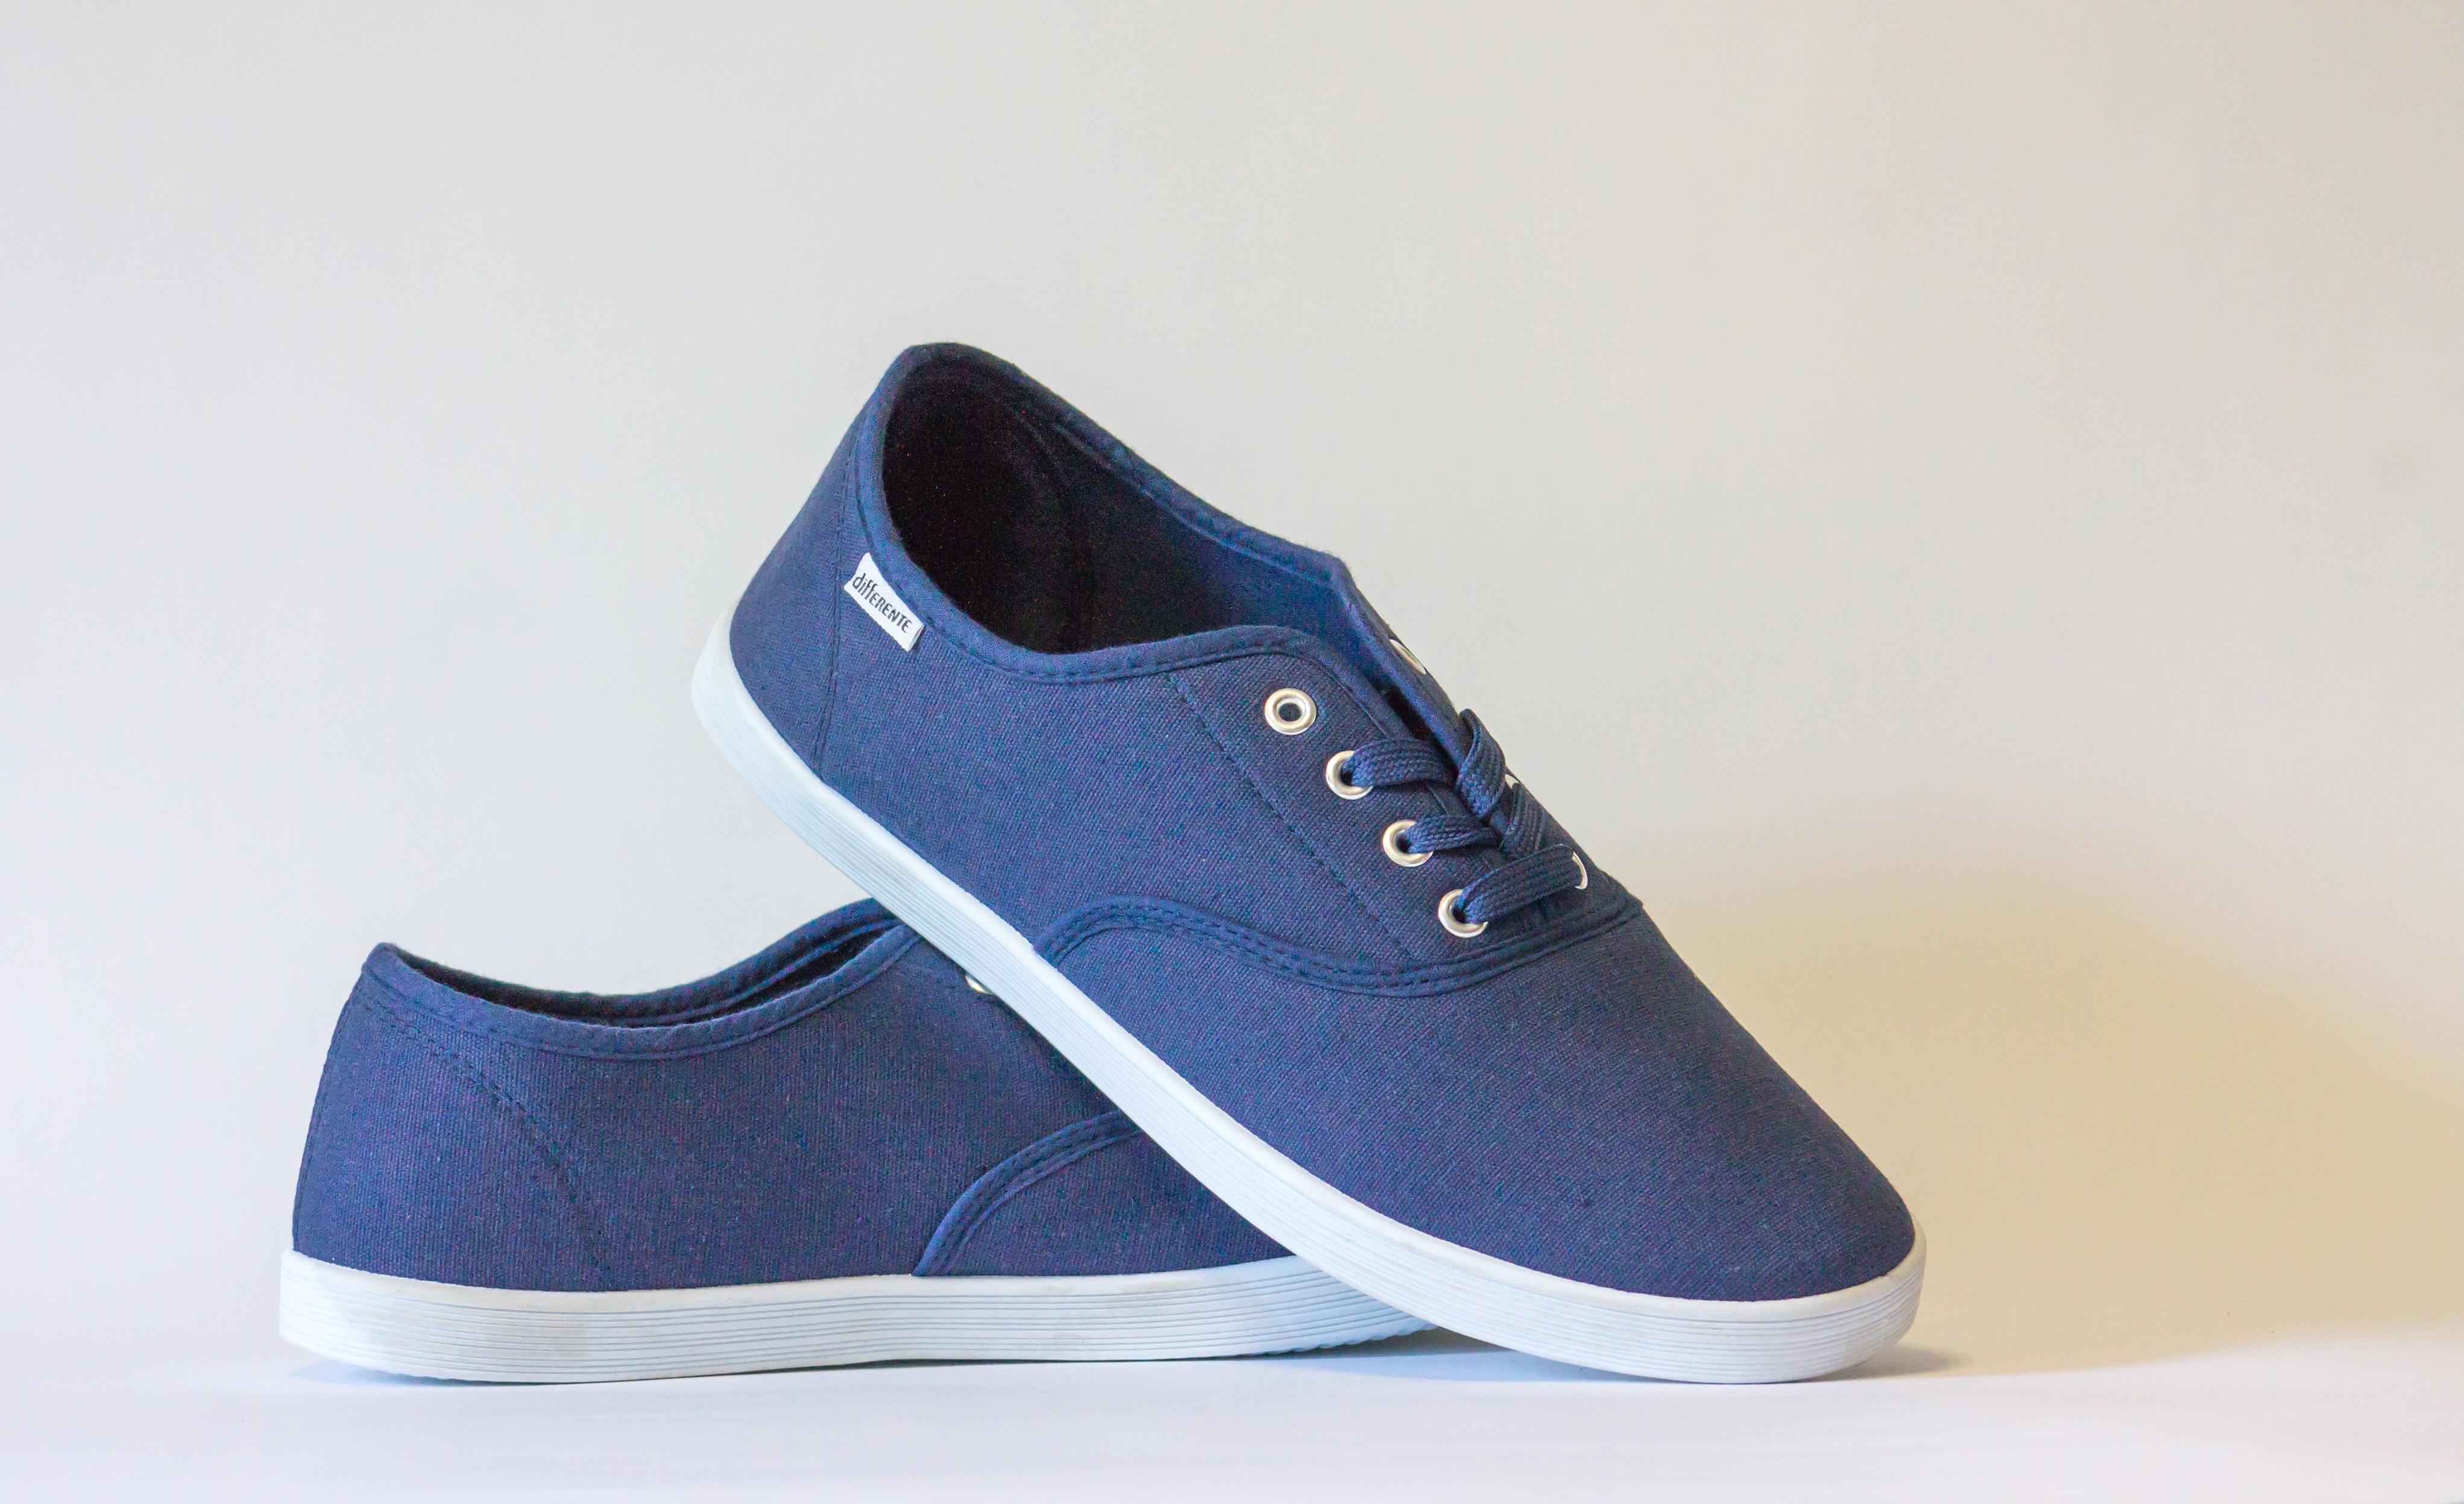 c84016d709e sko læder butik mode marked blå moderne materiale hipster brand produkt  tekstil sko herrer design kondisko